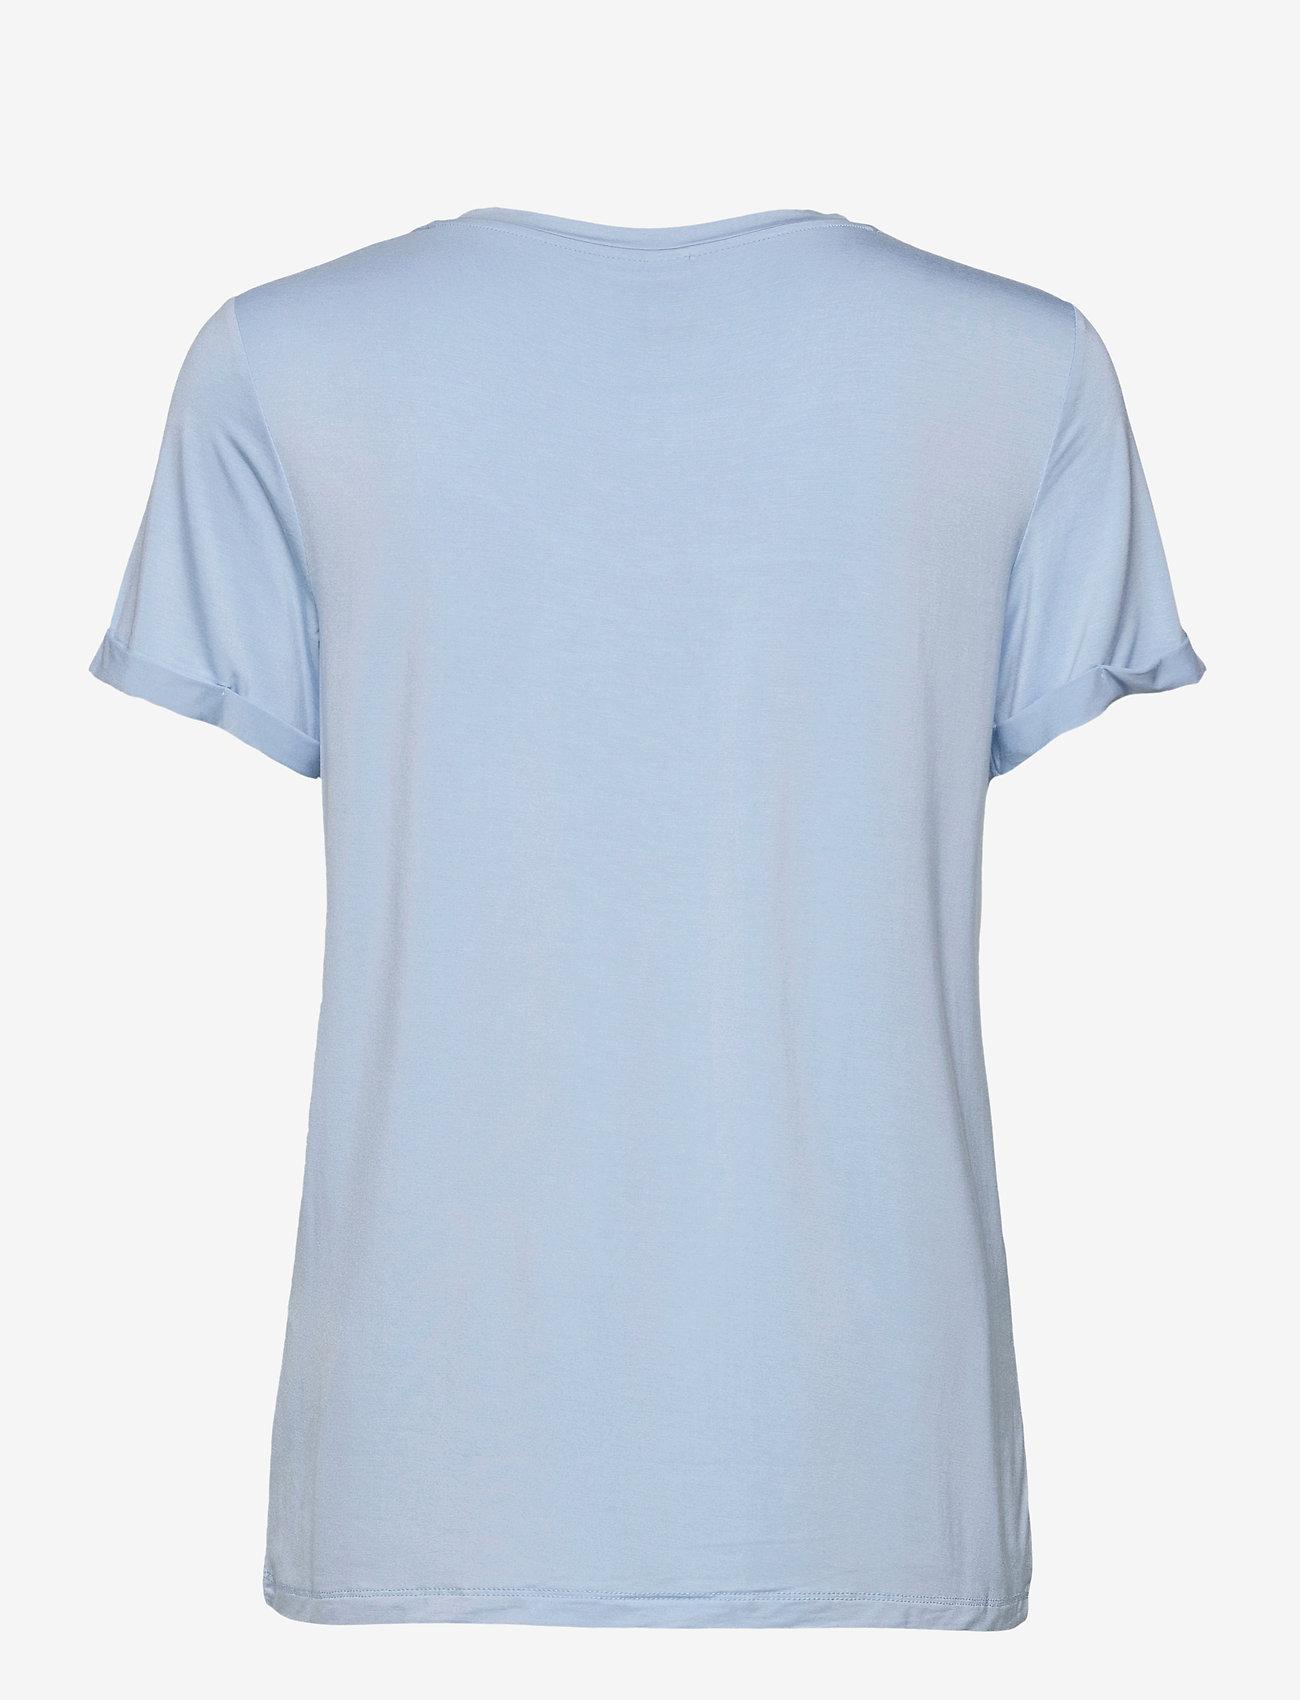 Soyaconcept - SC-MARICA FP - t-shirt & tops - powder blue - 1